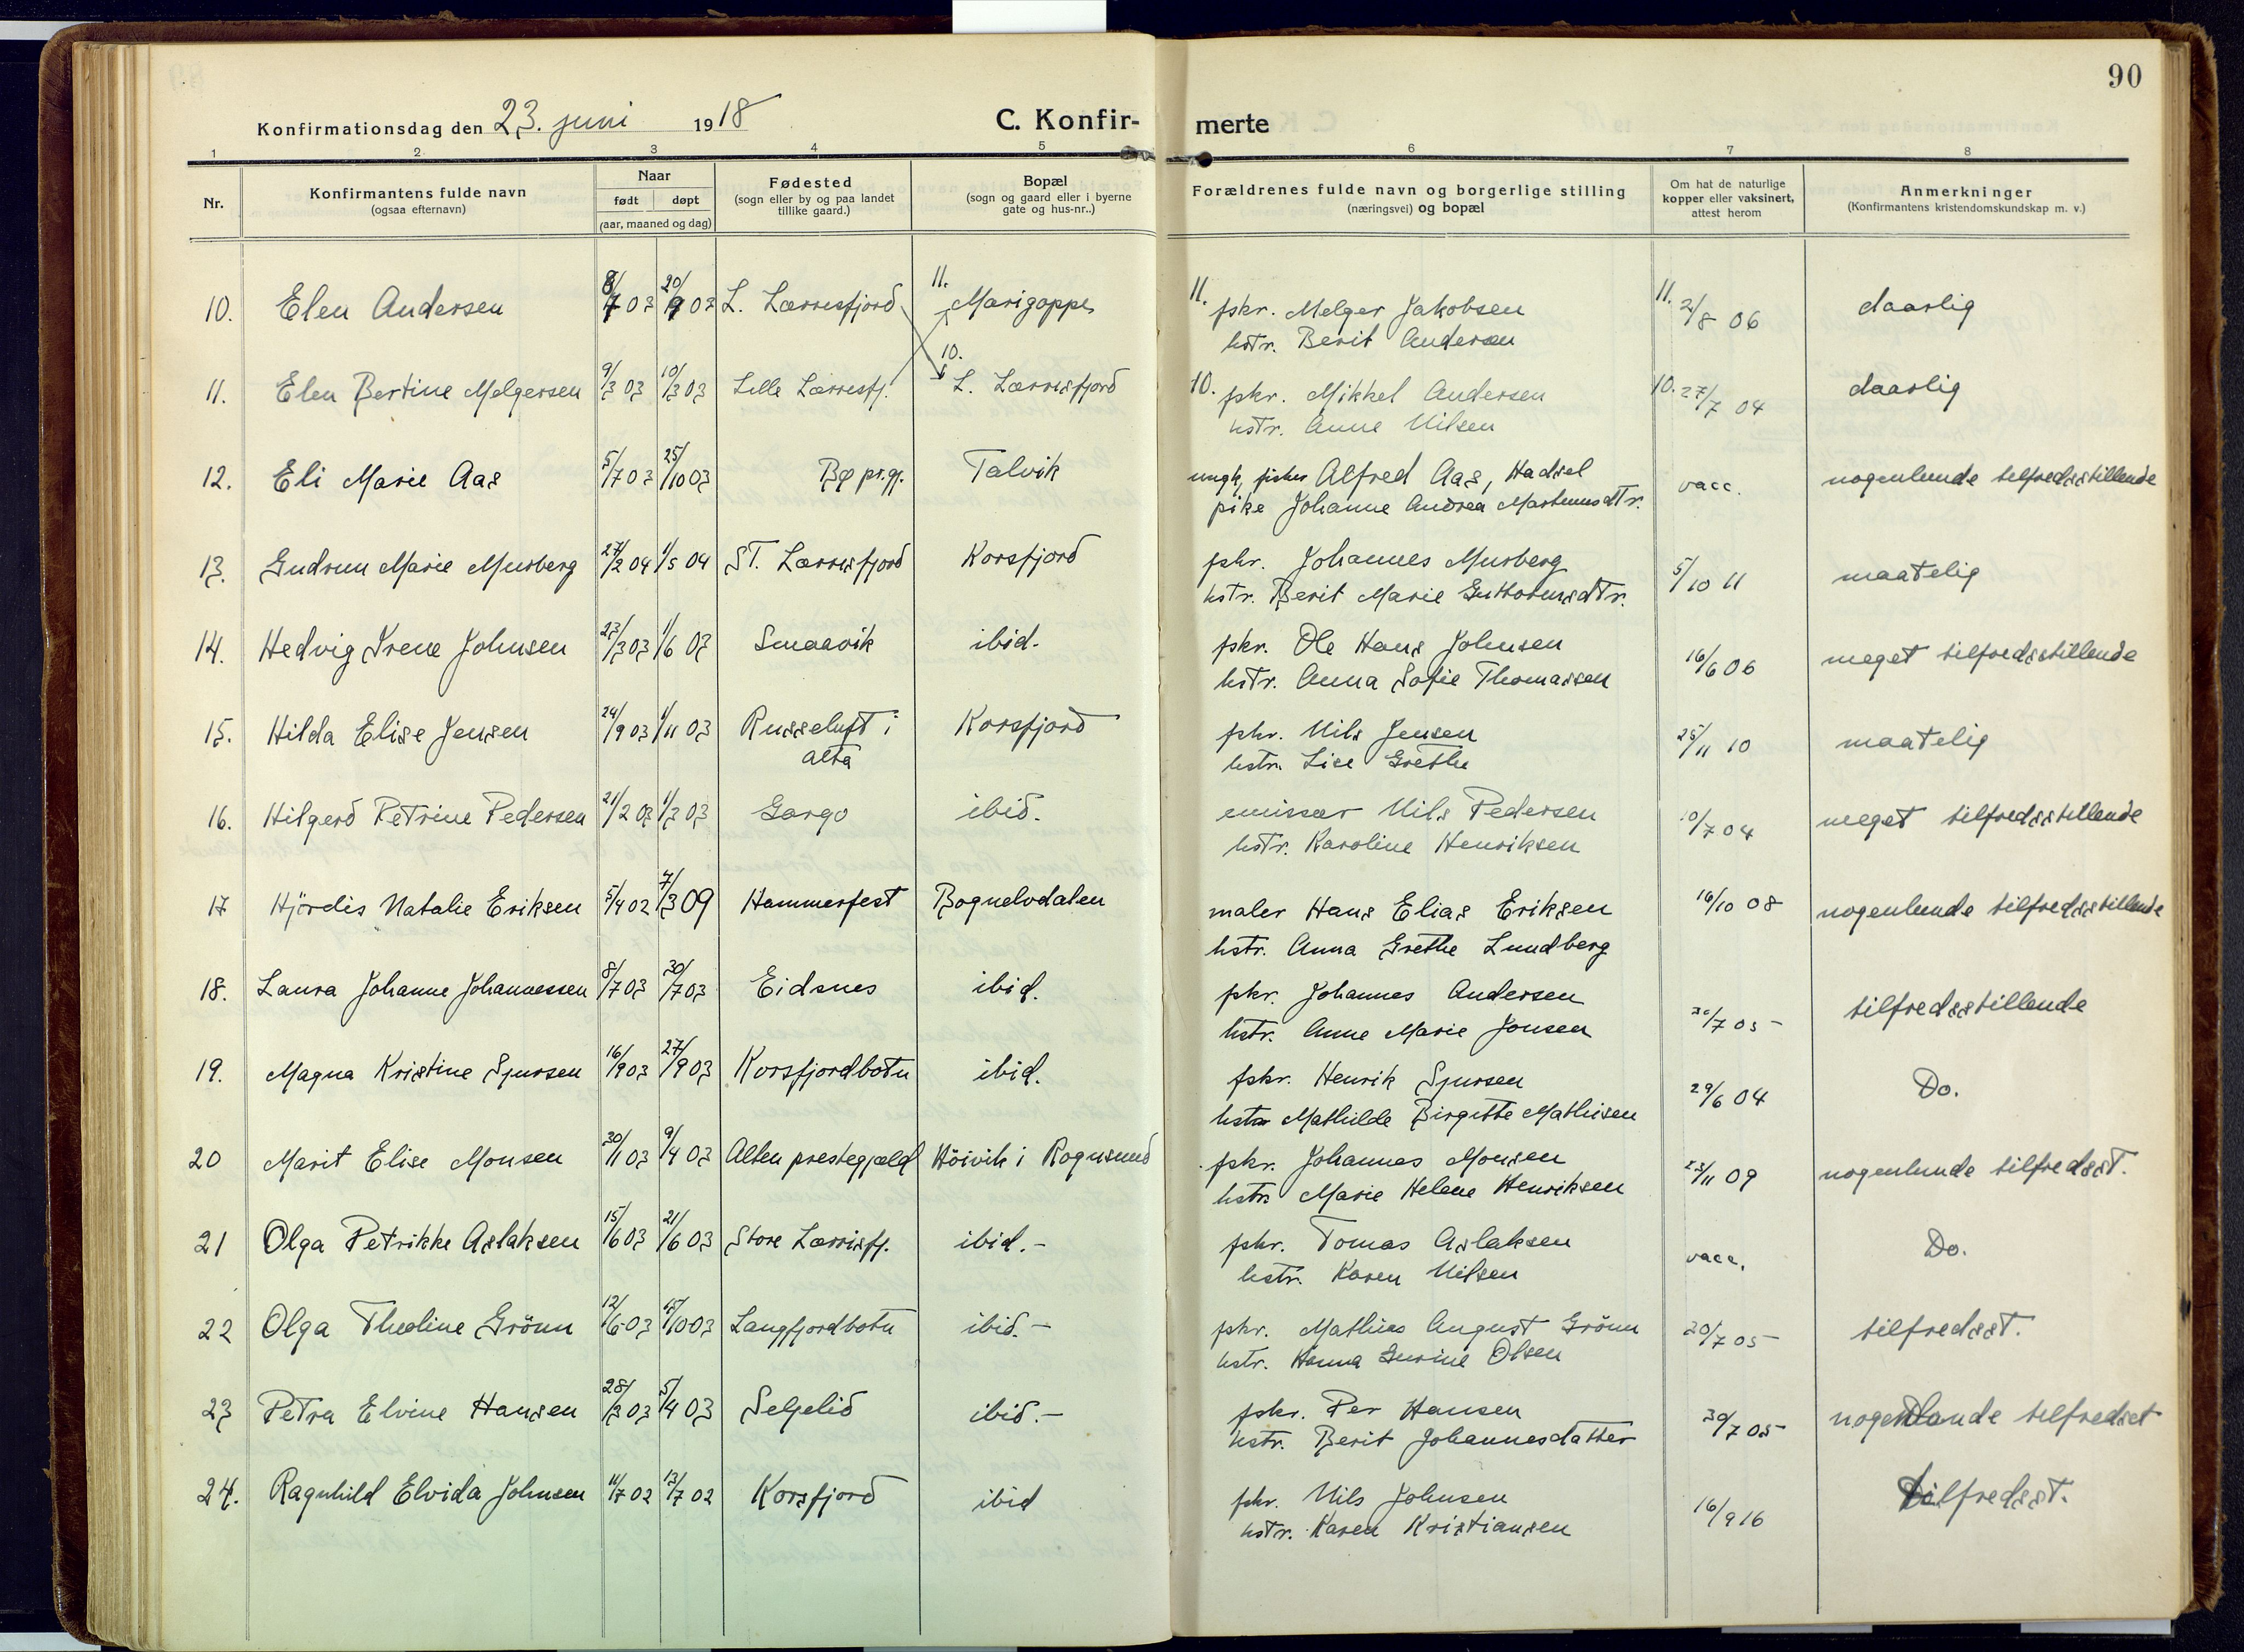 SATØ, Talvik sokneprestkontor, H/Ha/L0018kirke: Ministerialbok nr. 18, 1915-1924, s. 90